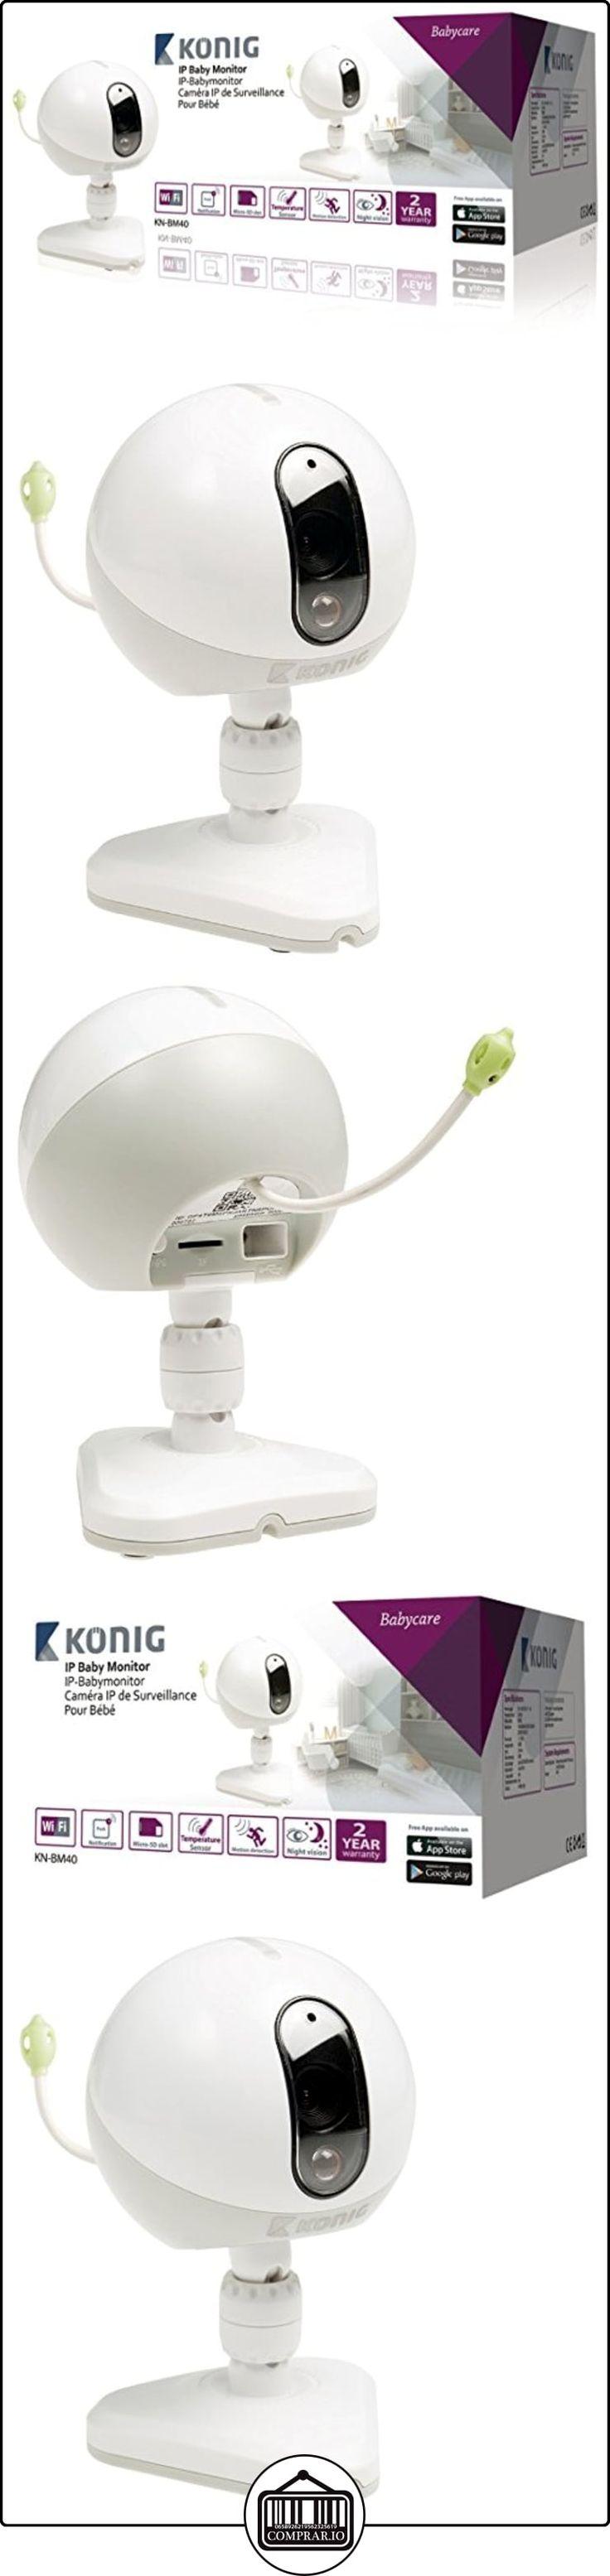 König KN-BM40 video-monitor para bebés - Vigilabebé (Wi-Fi, Corriente alterna, Color blanco, CMOS, IR, 160 x 120,320 x 240,640 x 480 Pixeles)  ✿ Vigilabebés - Seguridad ✿ ▬► Ver oferta: http://comprar.io/goto/B00Q6C649C